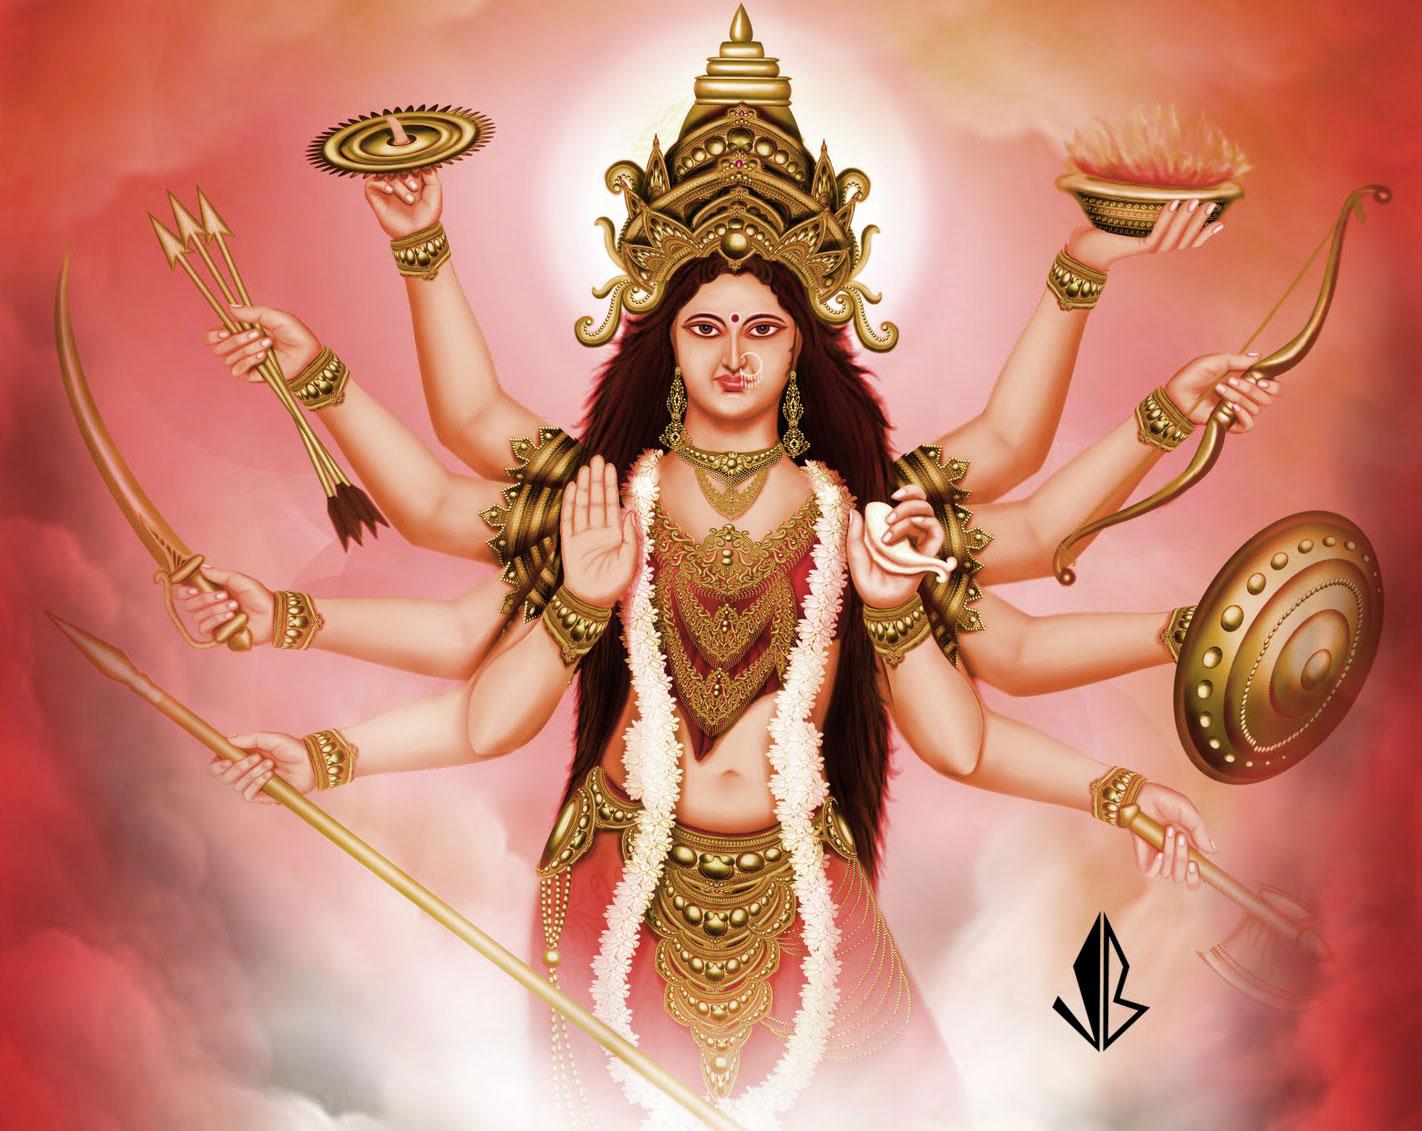 Good Wallpaper Lord Durga - Maa-Adi-Shakti-Durga-Beautiful-HD-Wallpaper-Happy-Durga-Puja-Navratri-HD-Wallpaper-Pics-Jai-Mata-Di-Durga-HD-Wallpaper-Pics-Download  Picture_961356.jpg